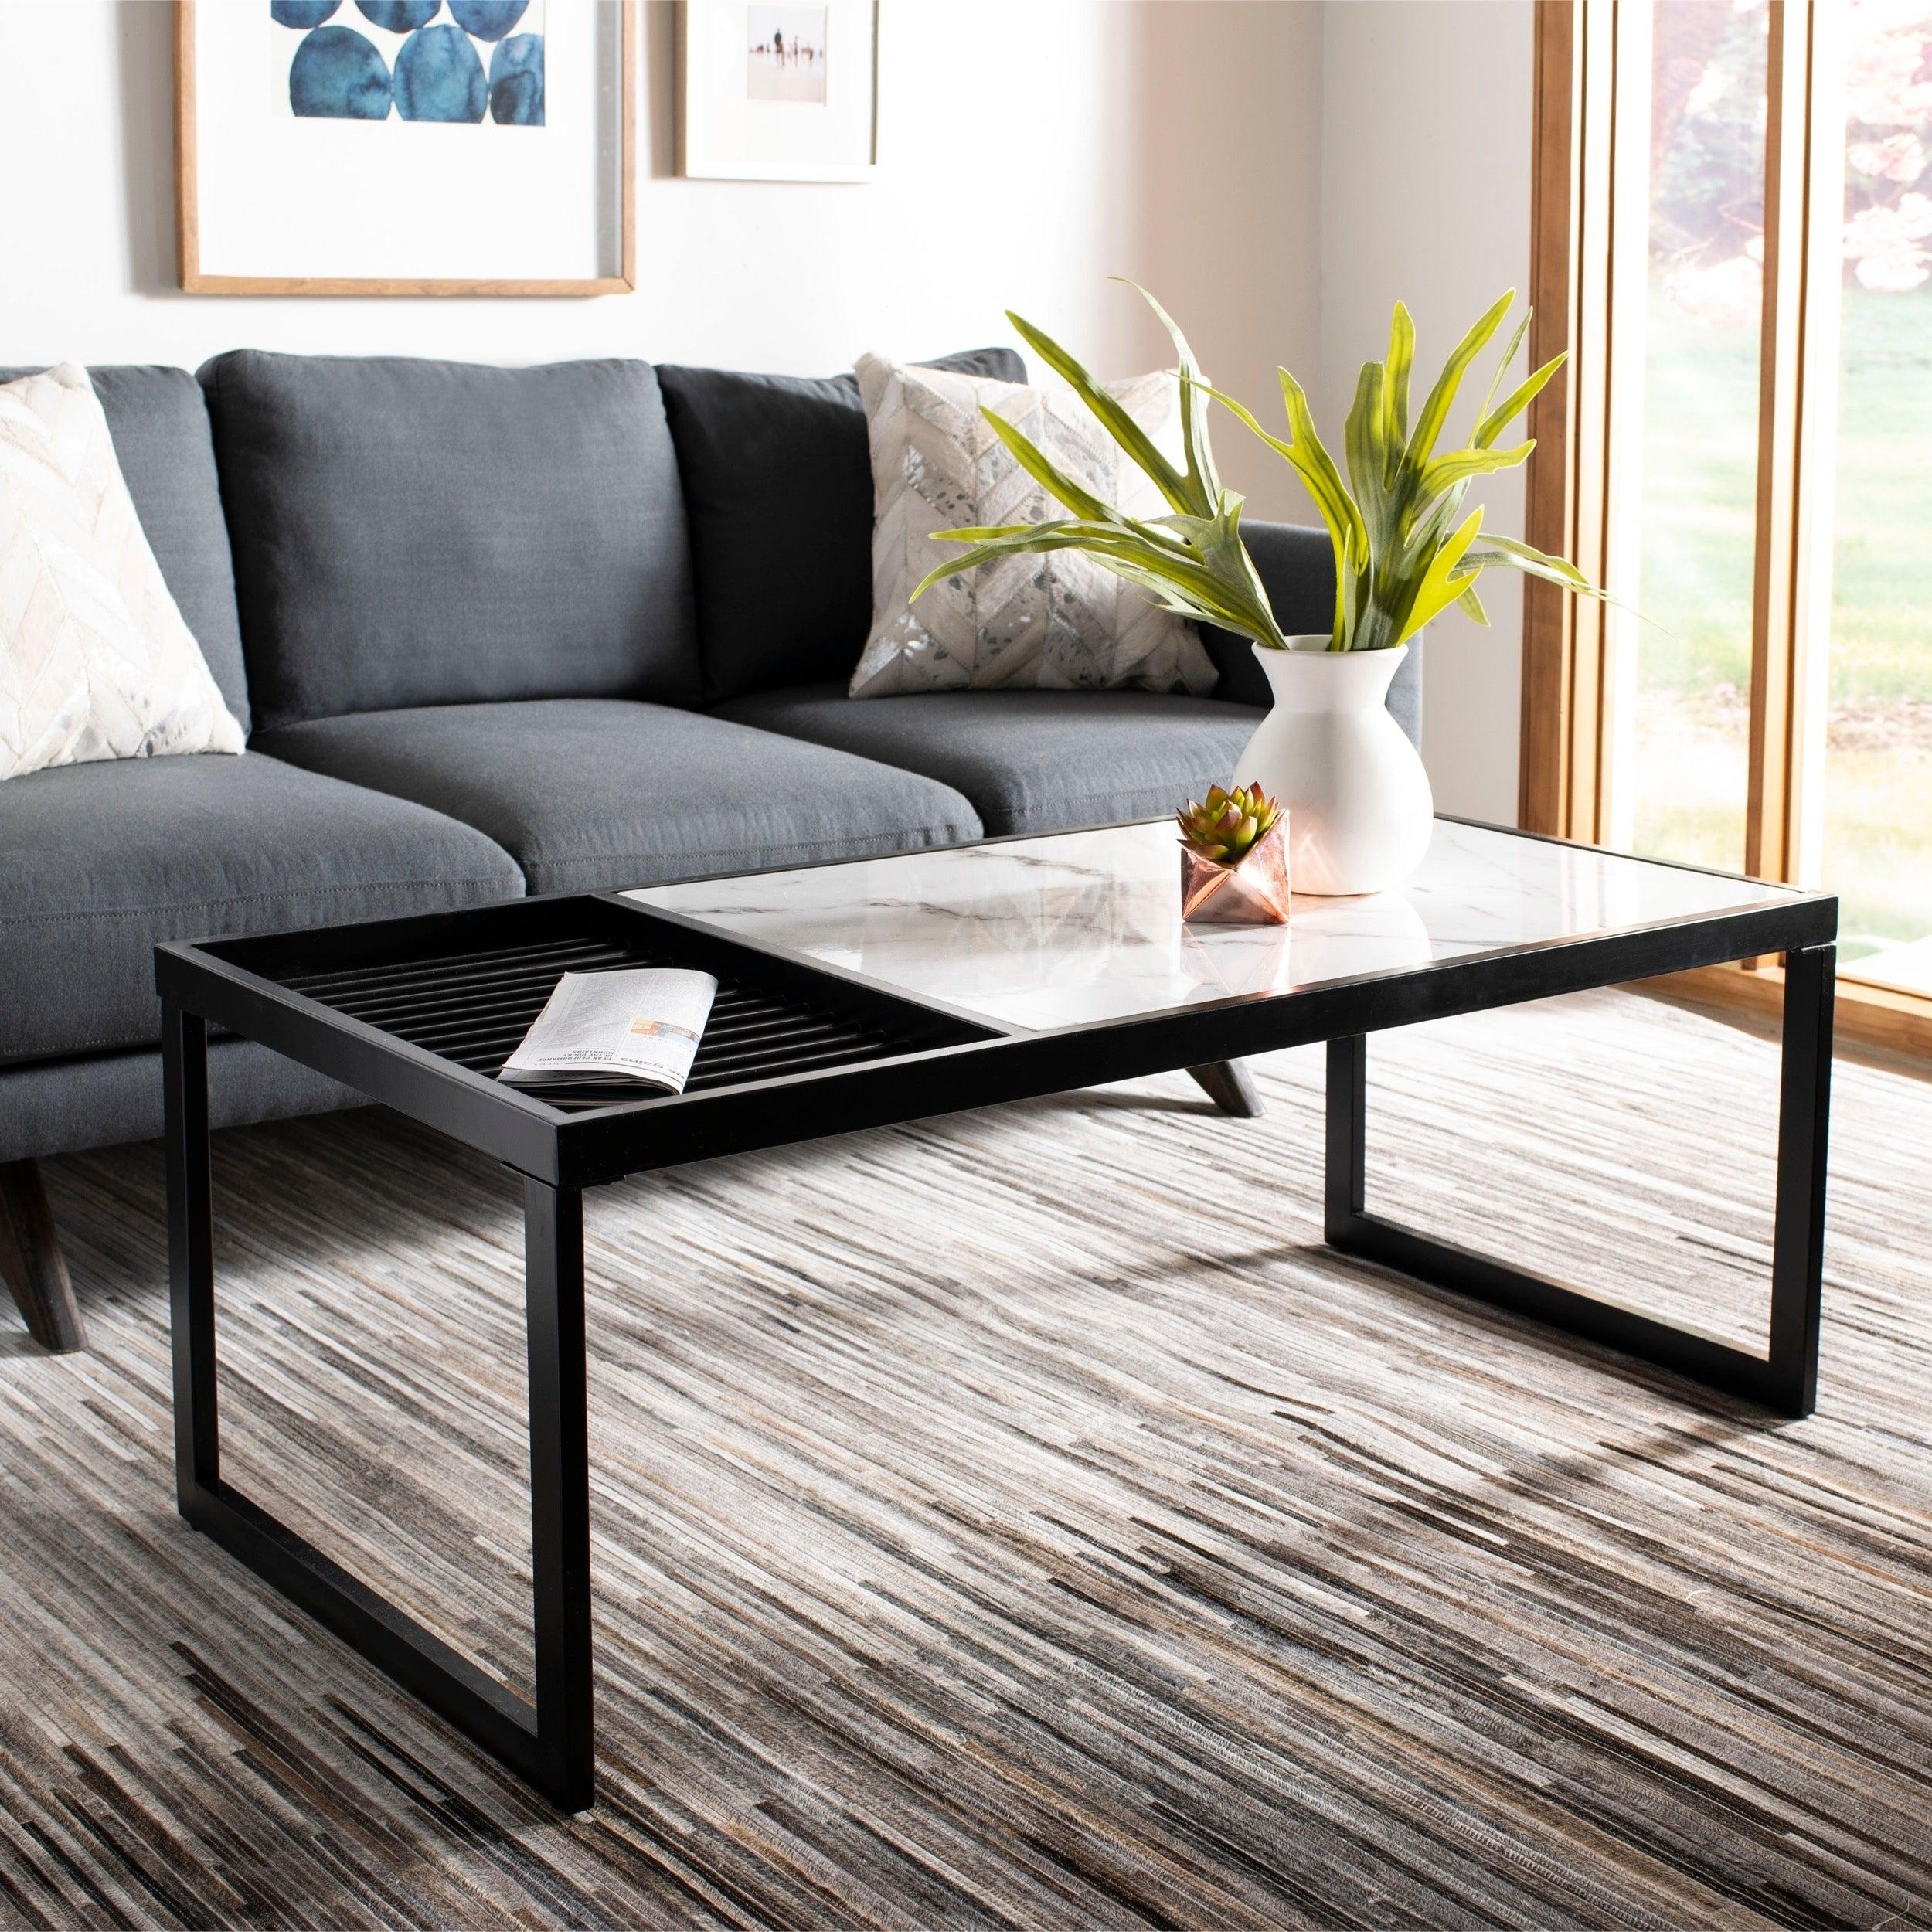 24 X 24 Coffee Table.Safavieh Zuri White Black Coffee Table 48 X 24 X 18